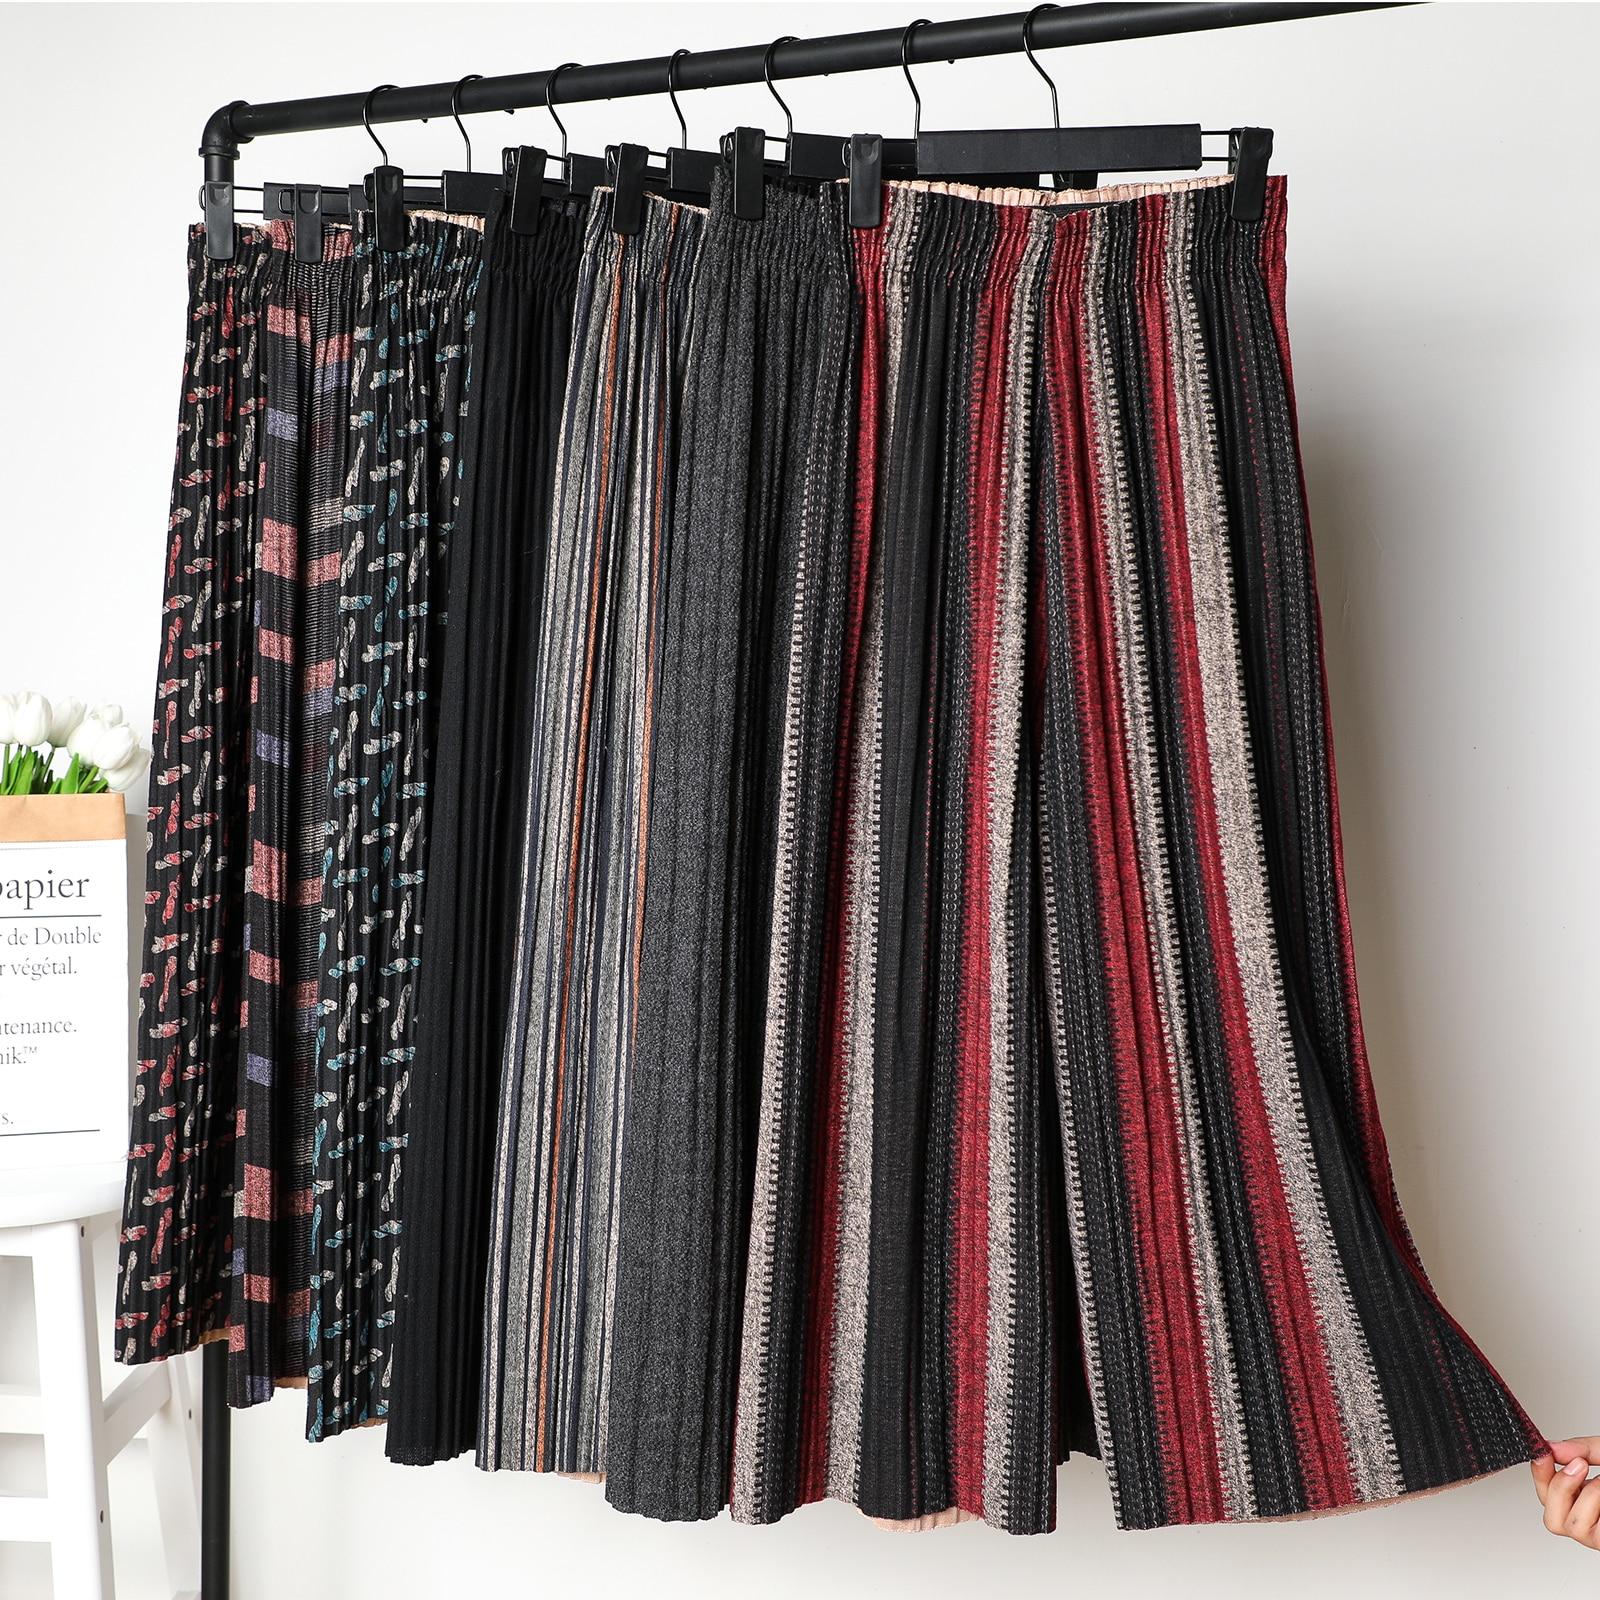 2019 New Autumn Winter Woolen Wide Leg Pants For Women Harem pant Elastic Waist Pleated Trousers